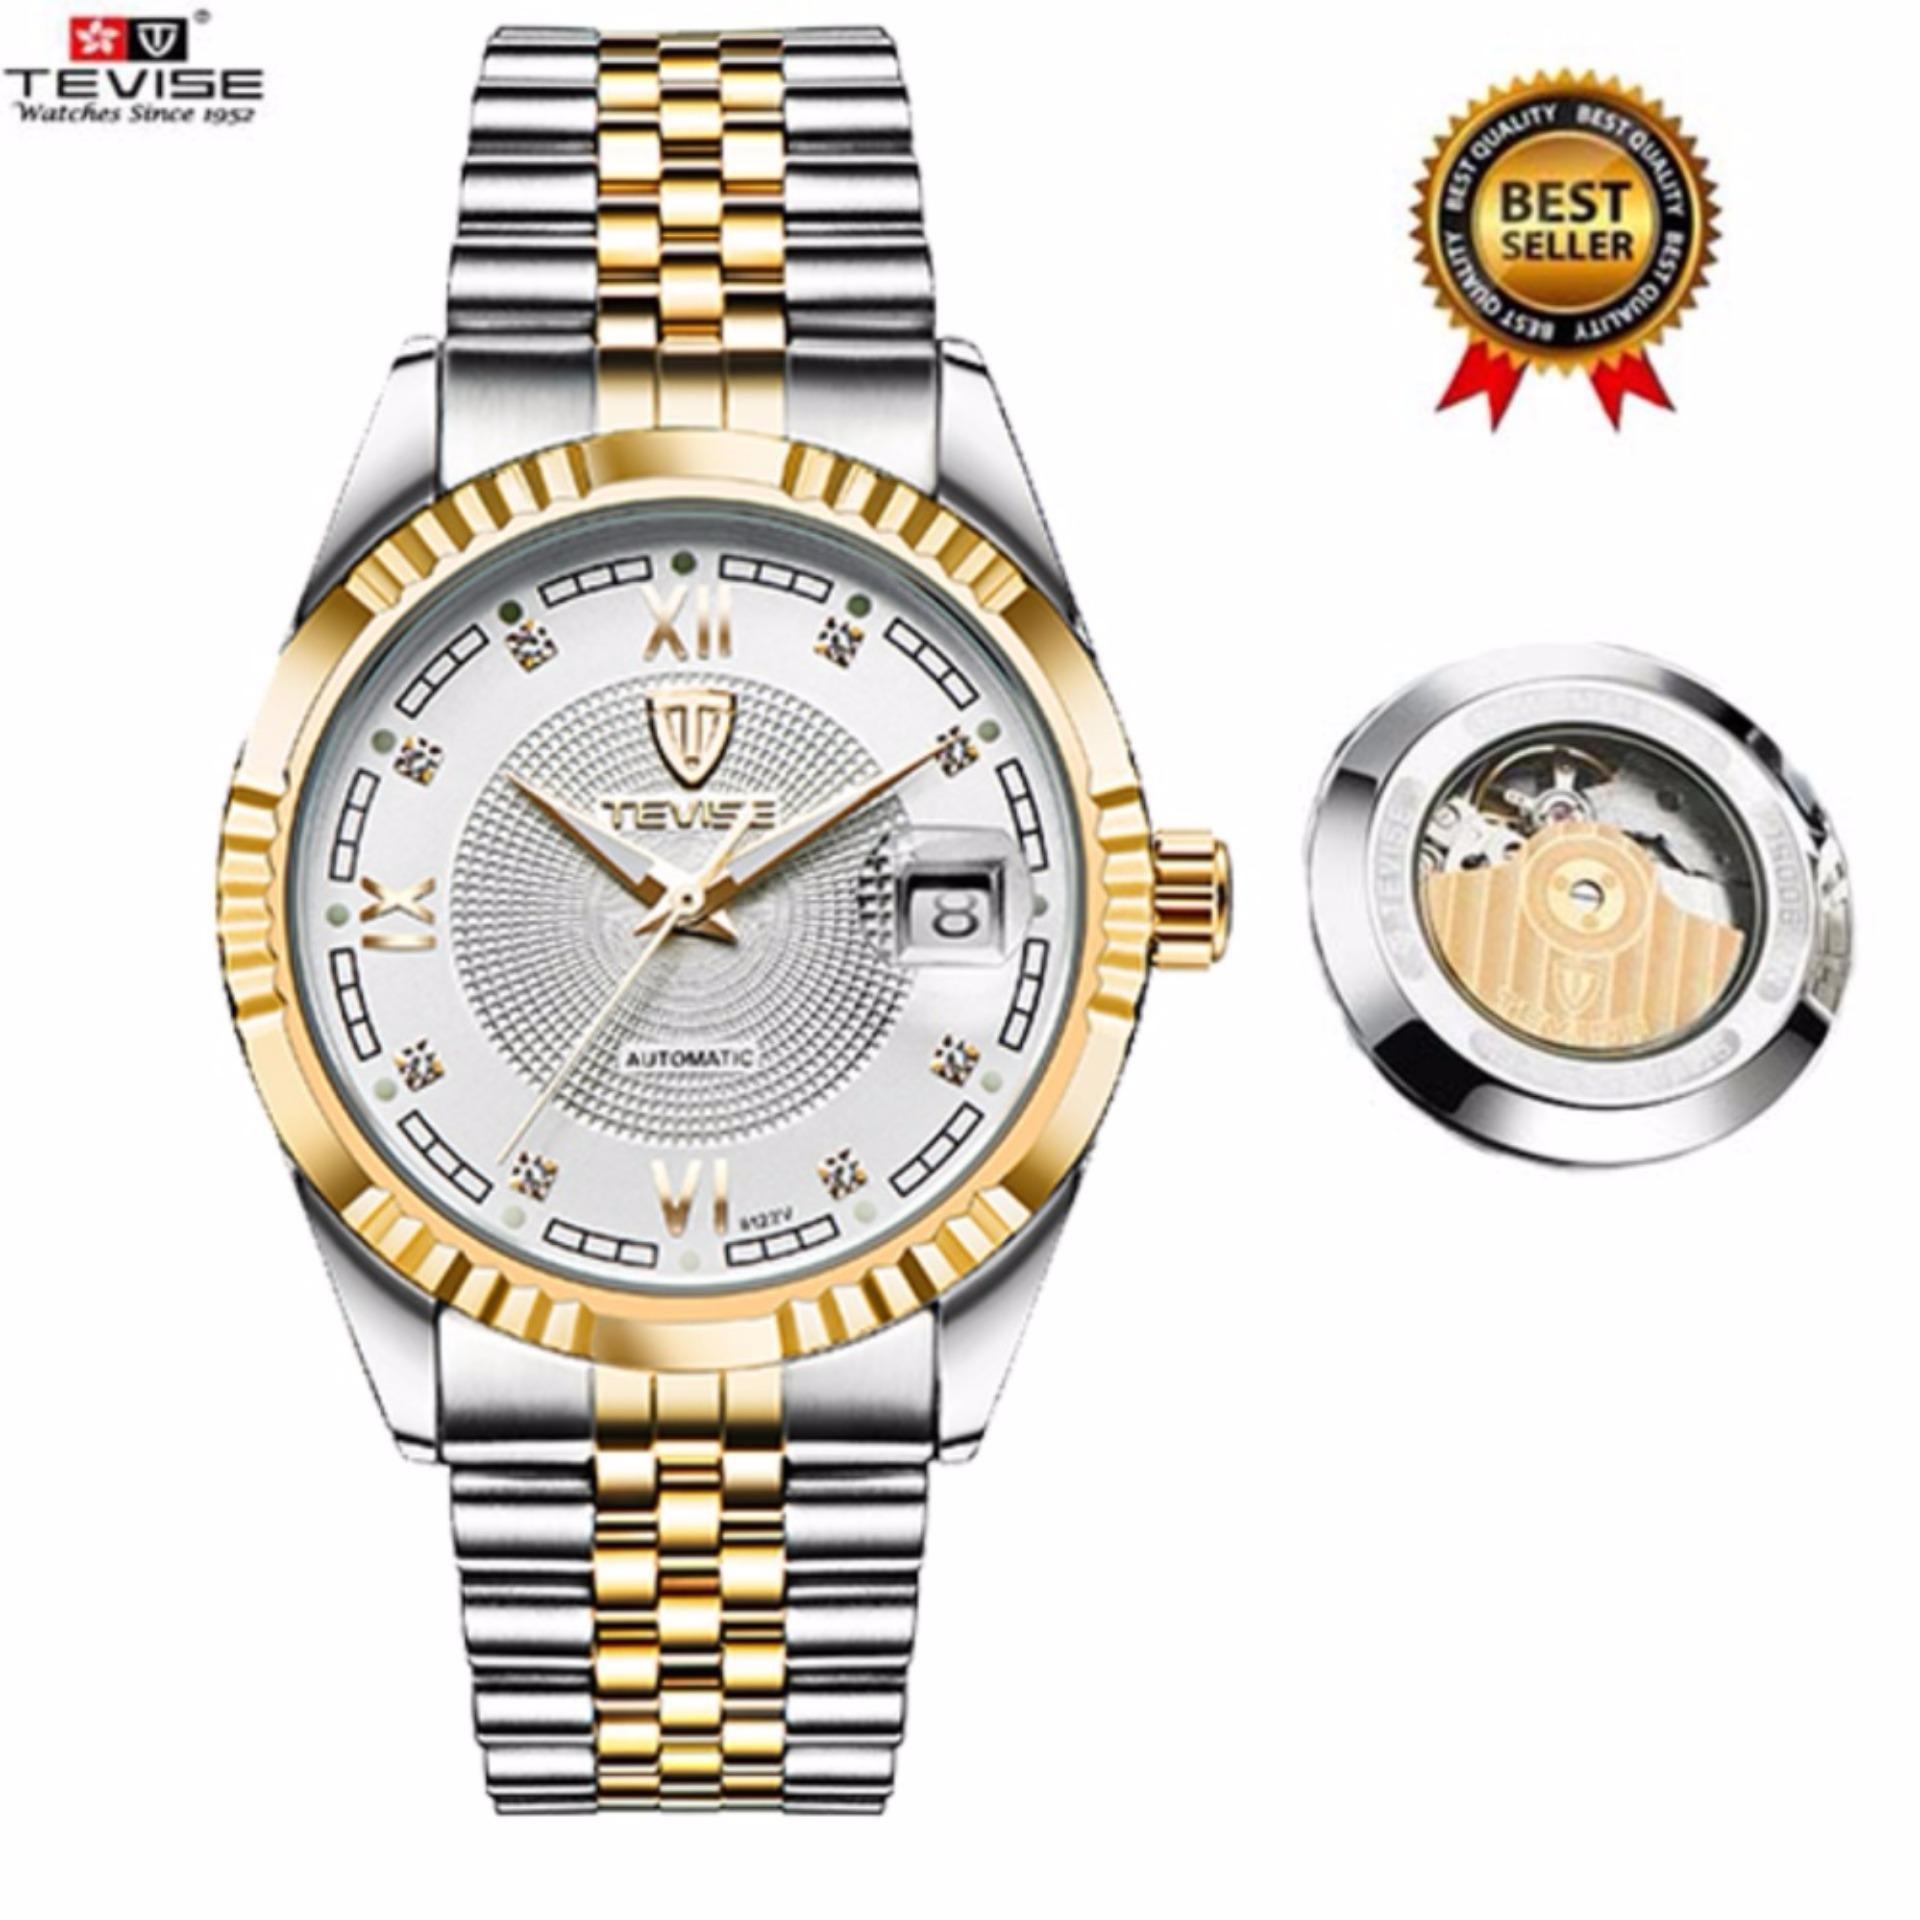 65d4cb193f9 Original TEVISE Mens Watches Automatic Mechanical Men Watch Mens  Wristwatches Luxury Men Boys Watches Clock relogio